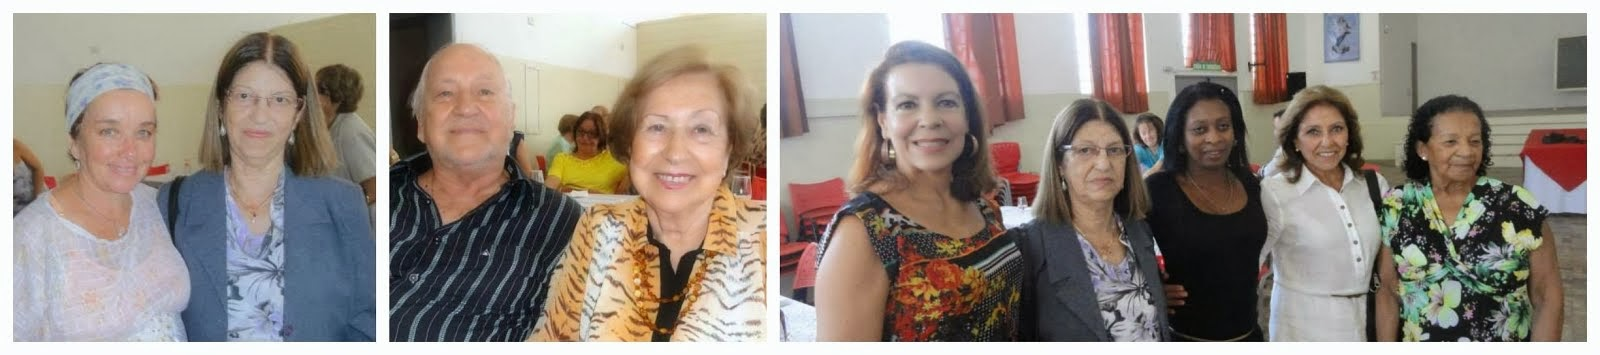 Patrona Felícia Teresinha Soares Lopes